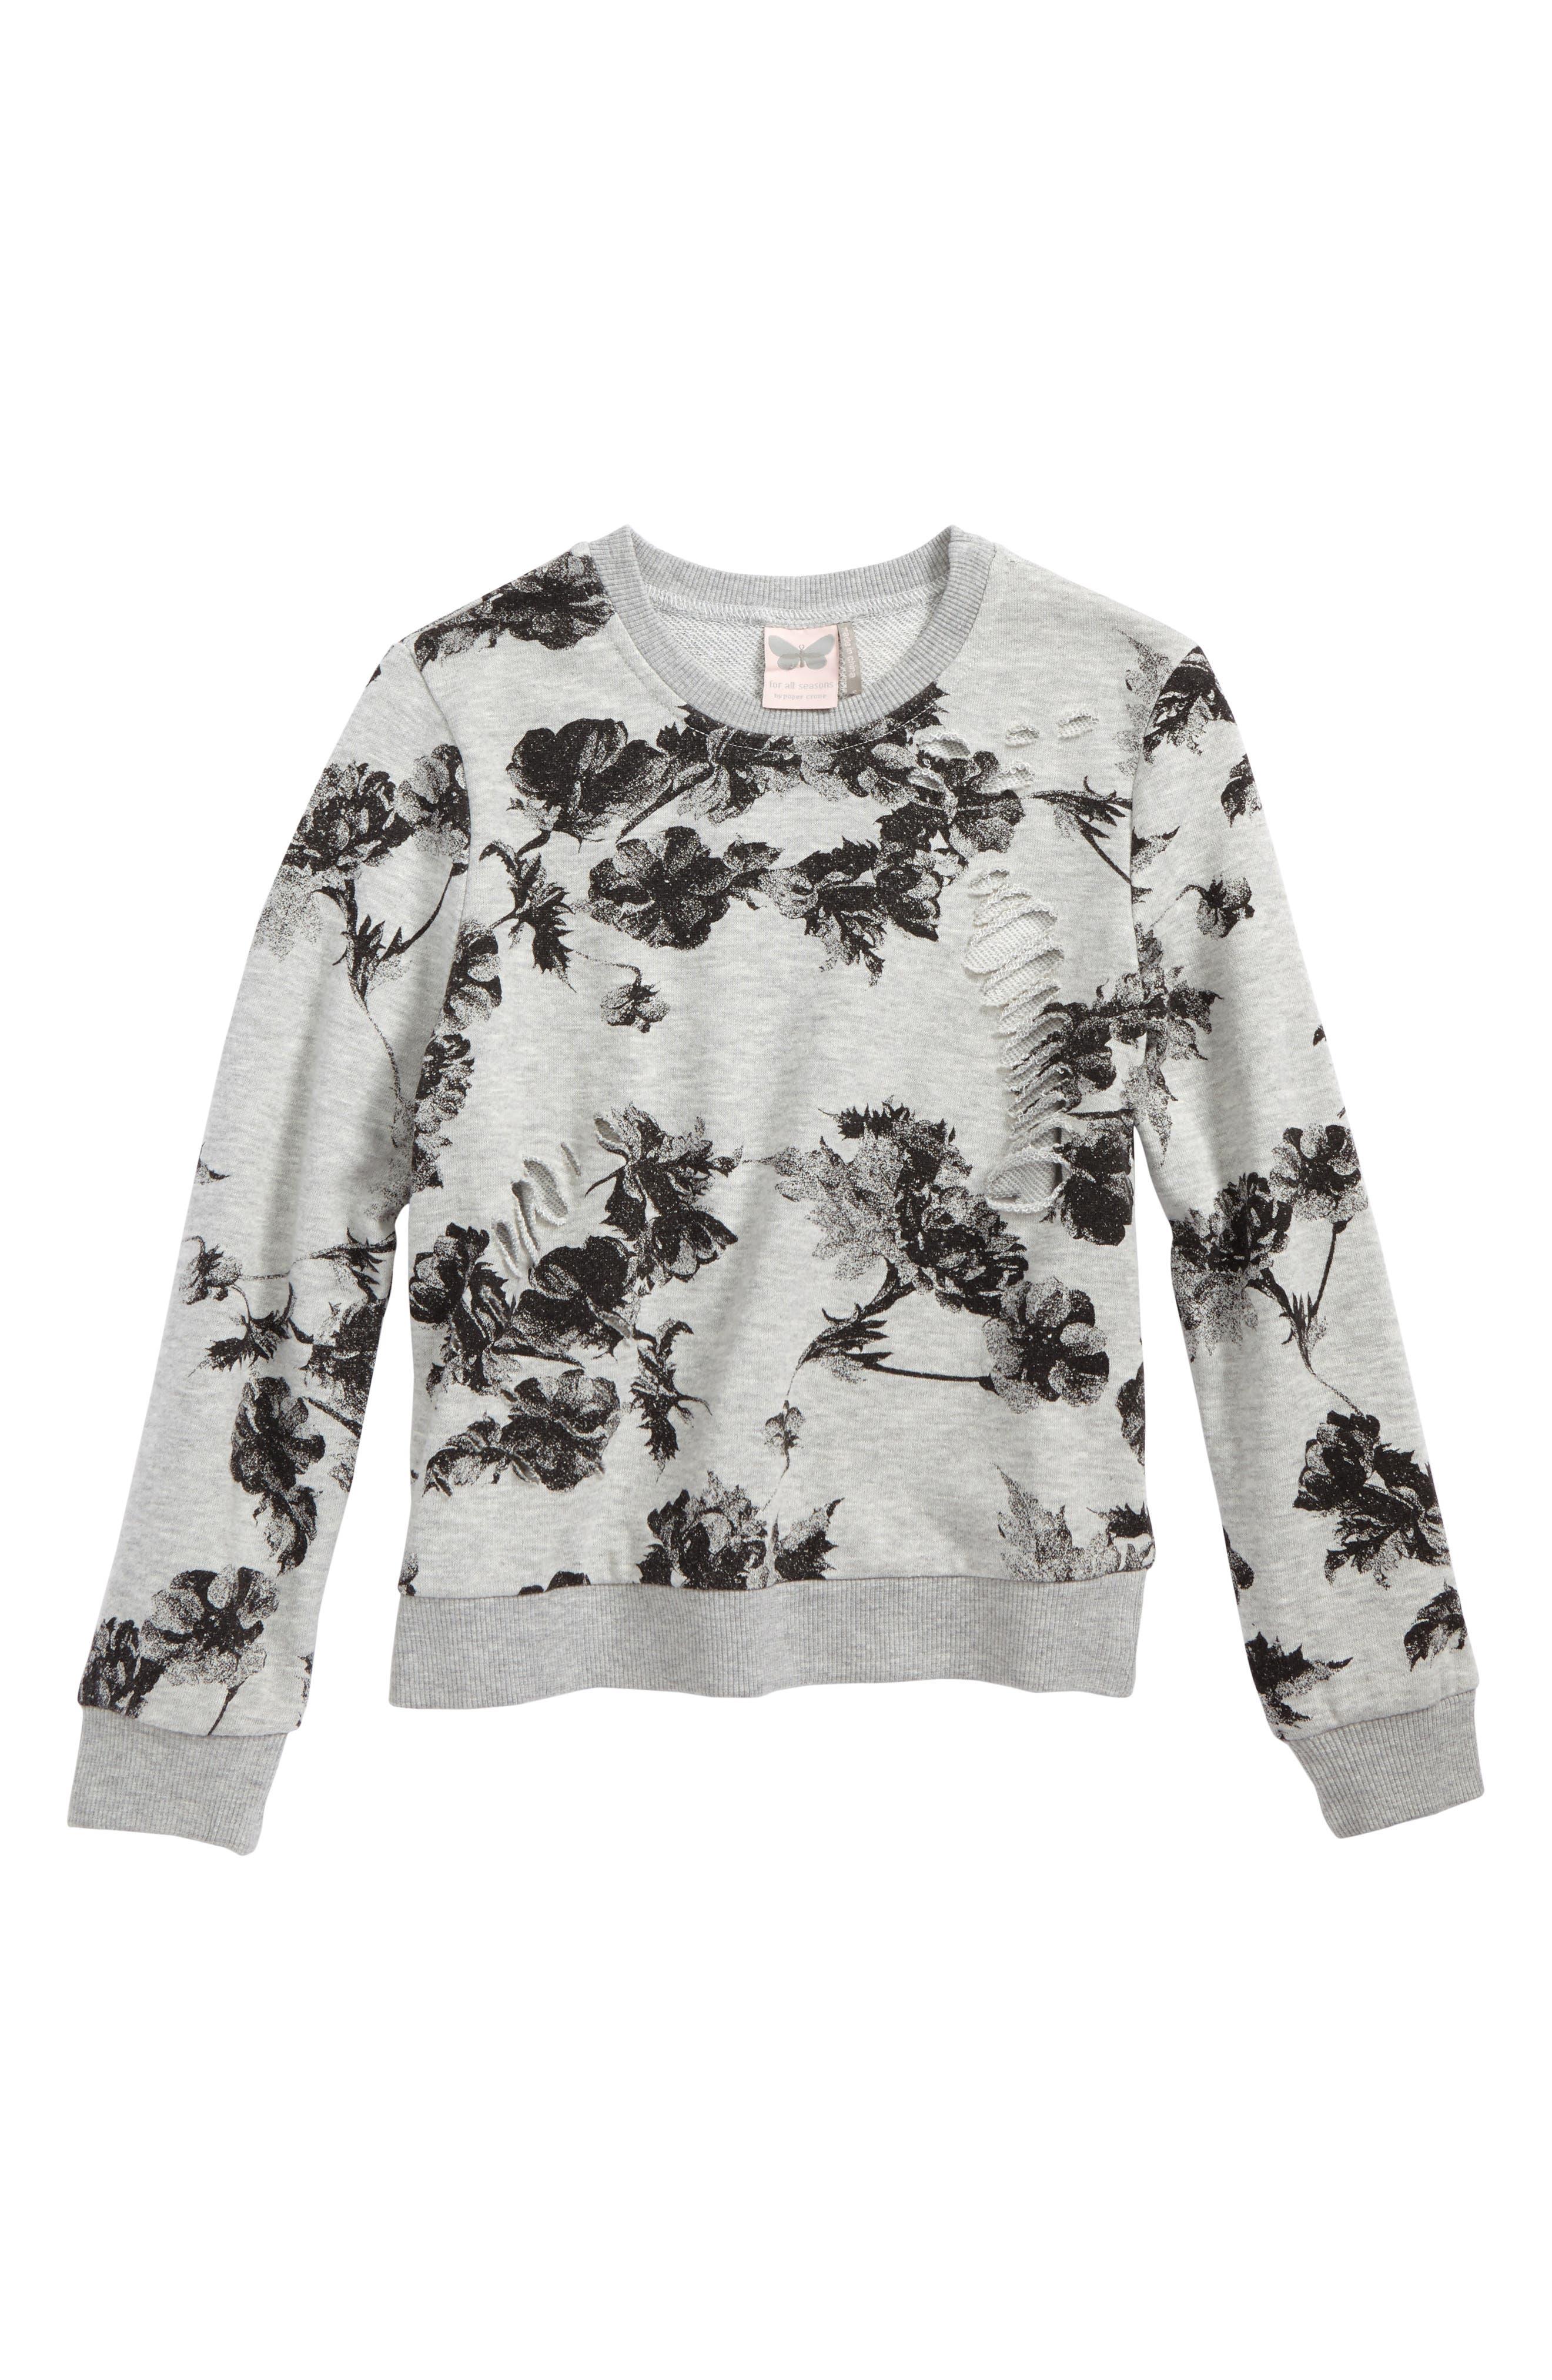 Alternate Image 1 Selected - For All Seasons Floral Print Sweatshirt (Big Girls)